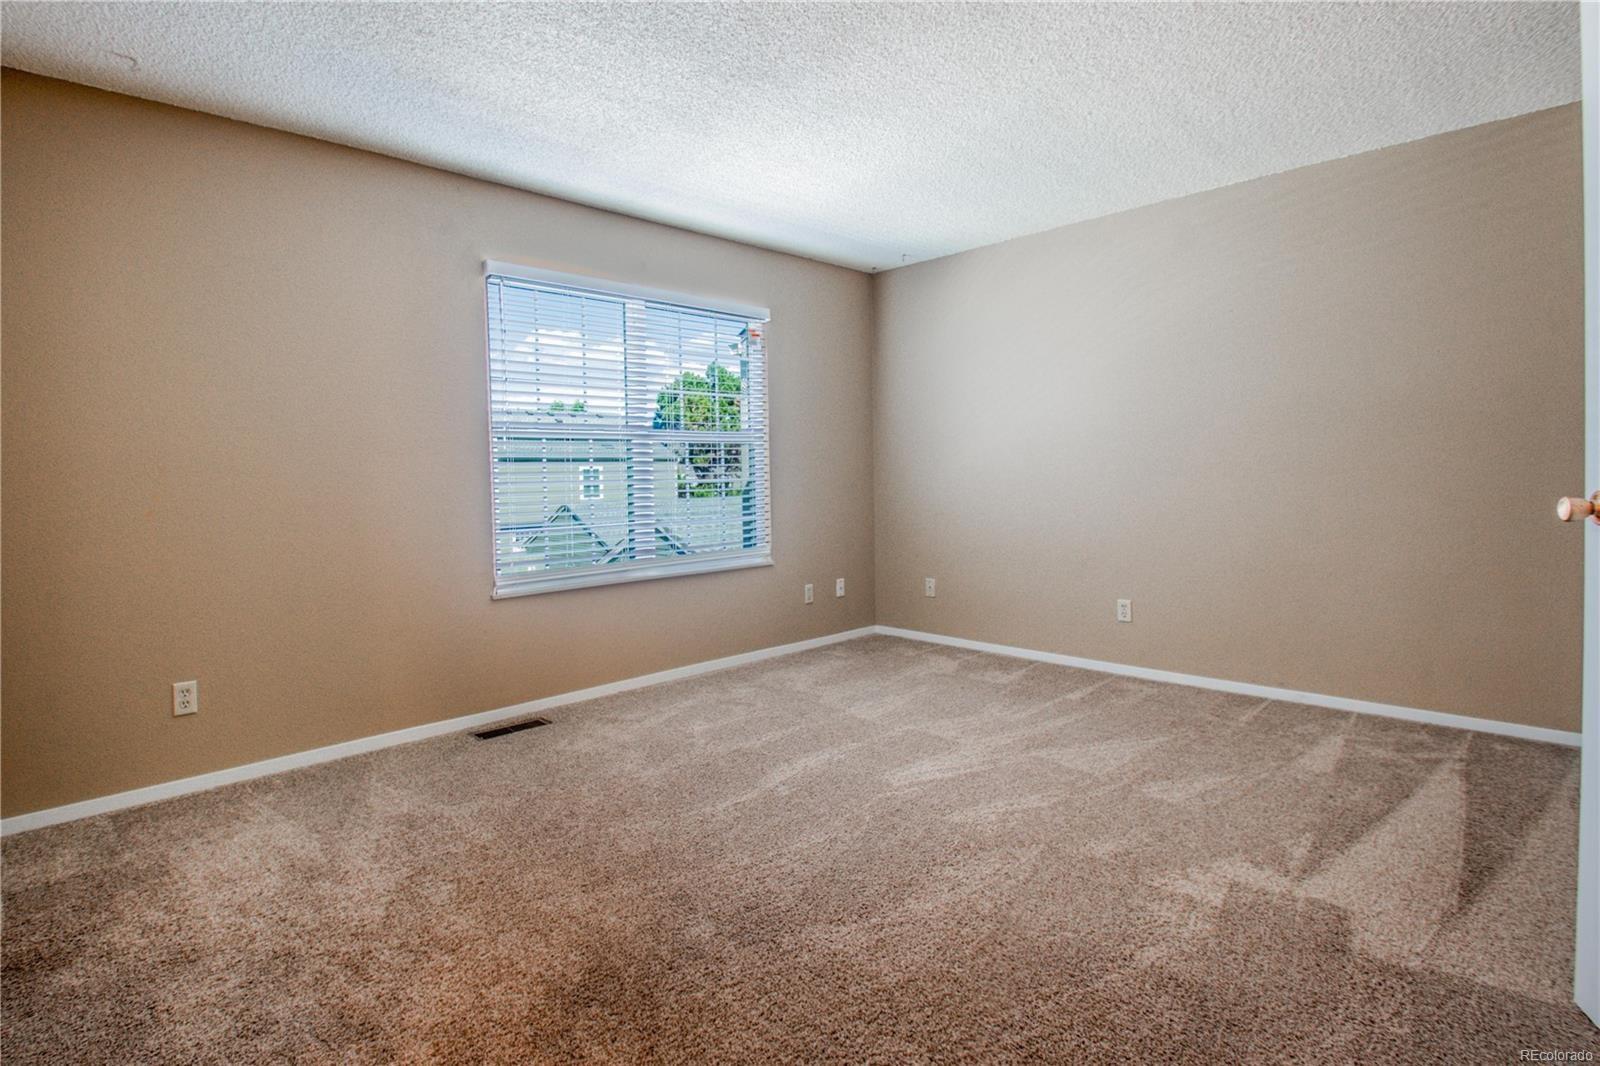 MLS# 4133319 - 8 - 3439 S Ammons Street #14-5, Lakewood, CO 80227